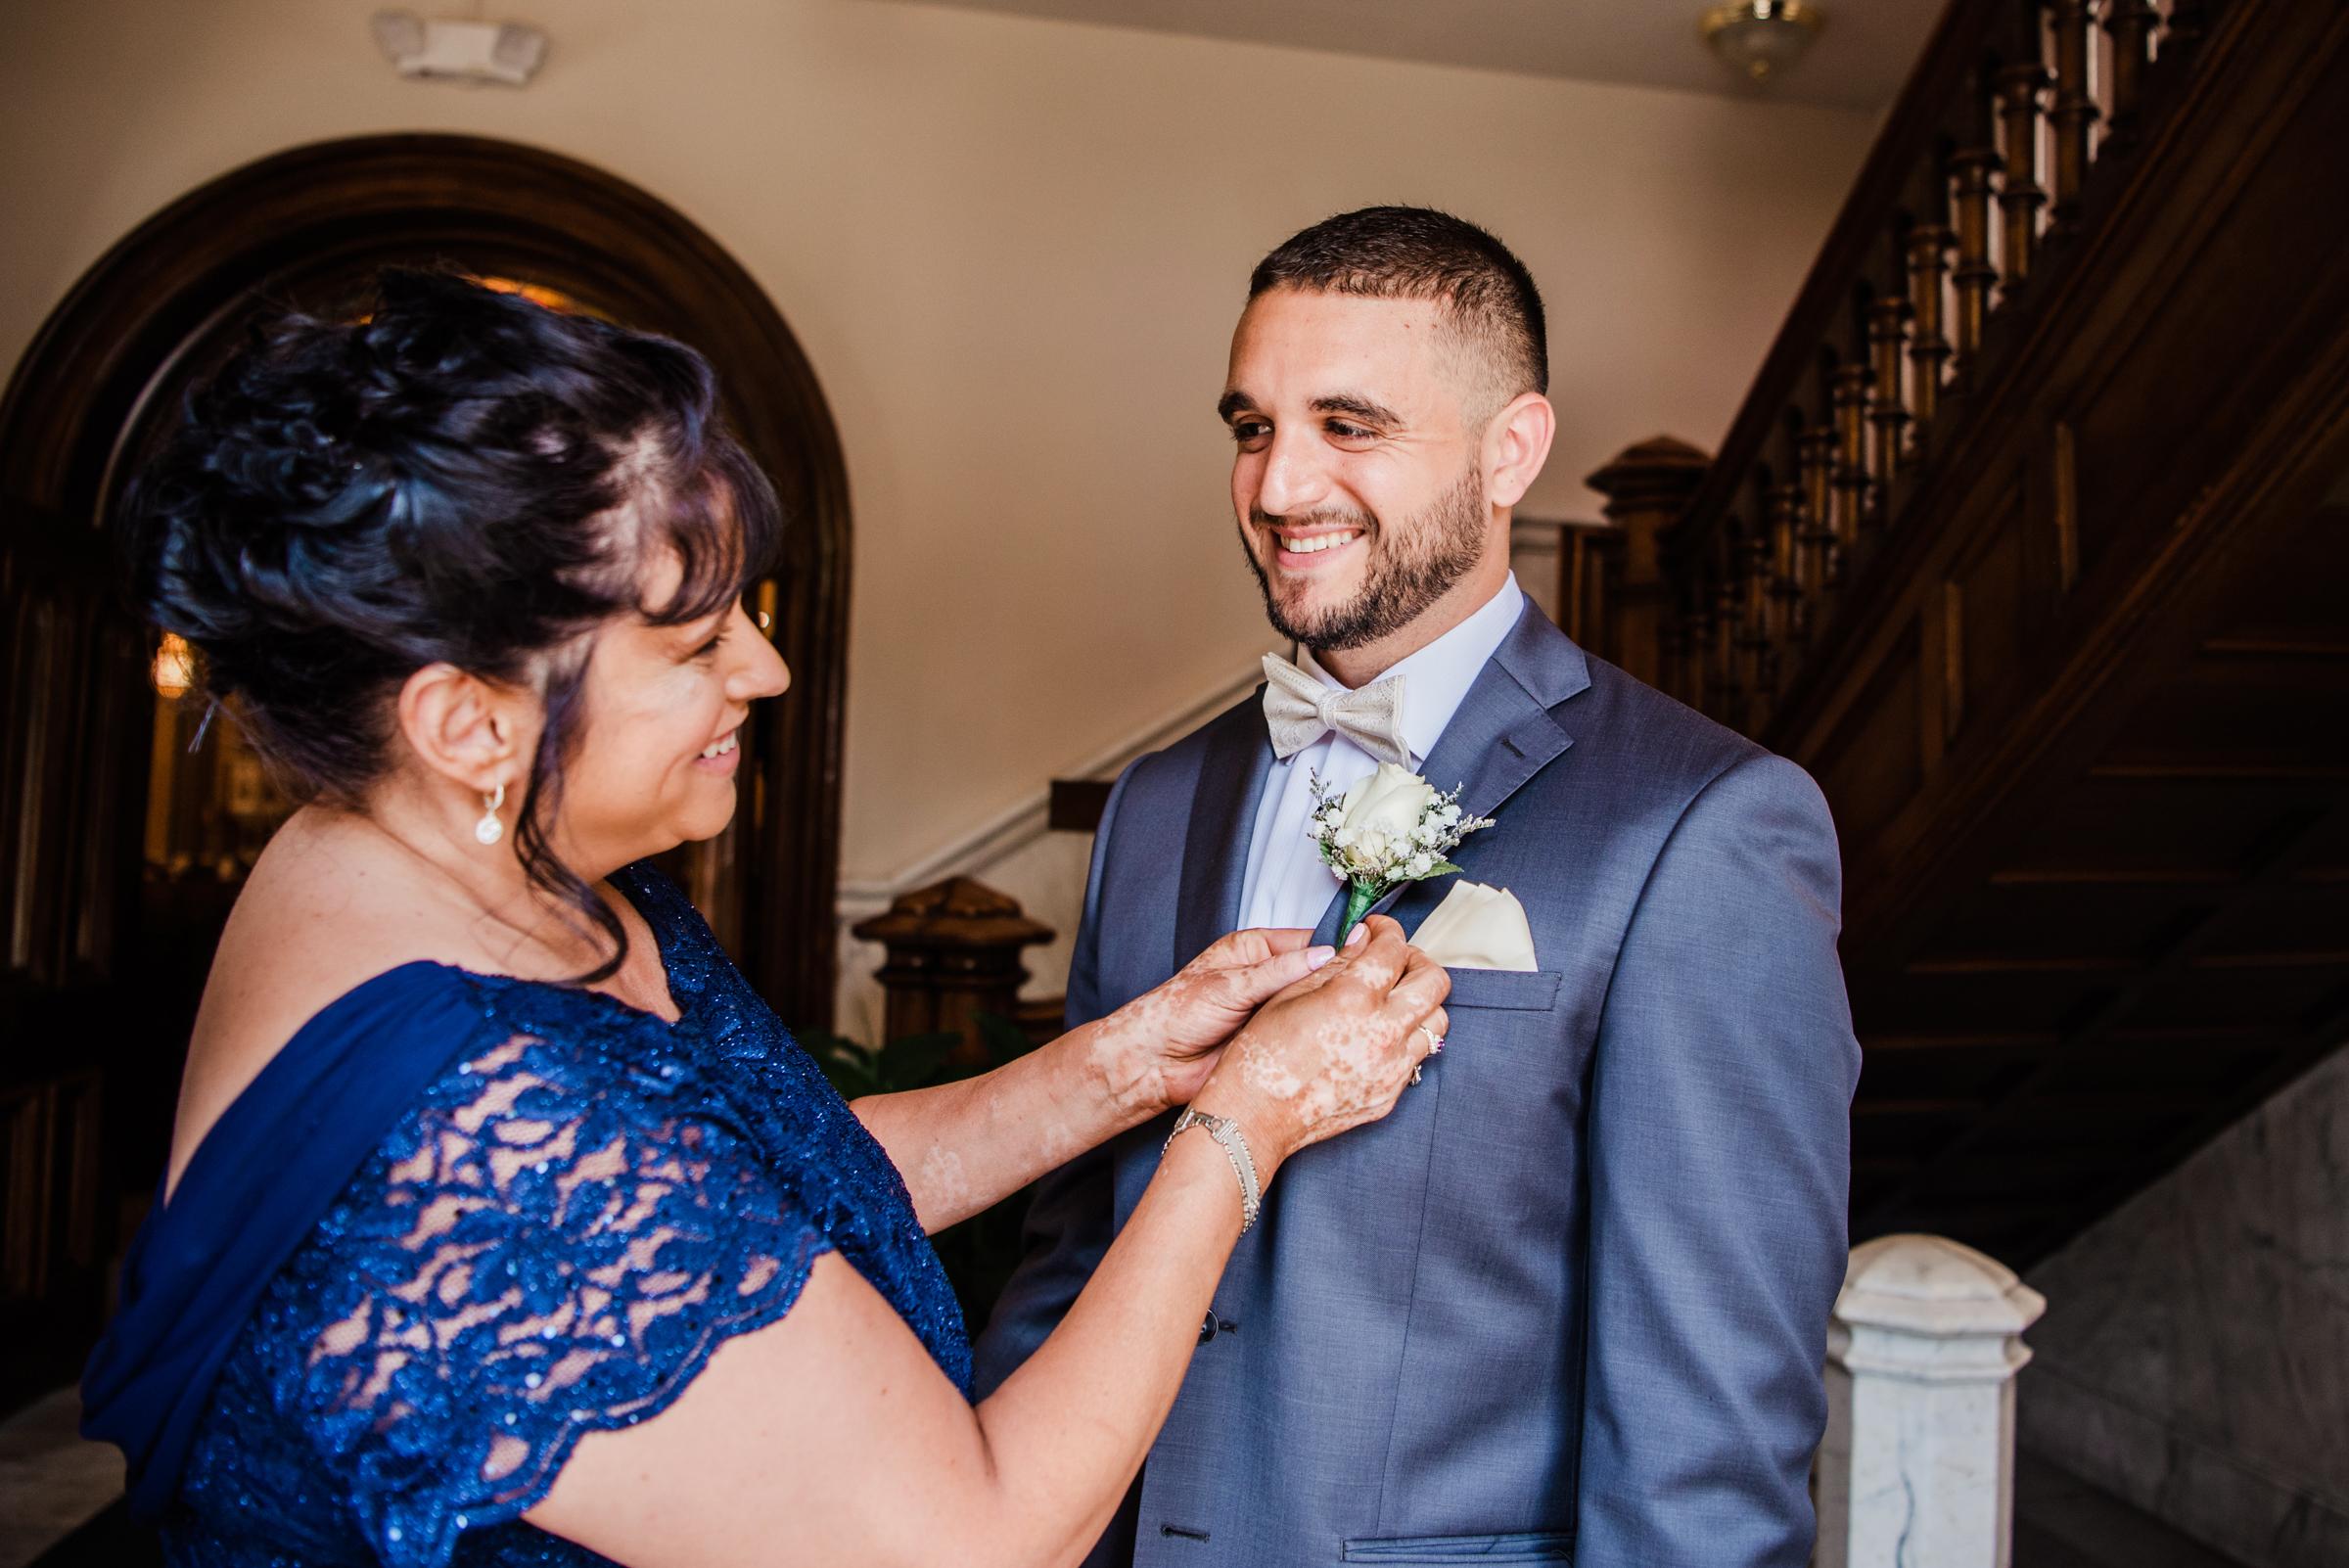 Historic_Old_St_Johns_Church_Valentinos_Banquet_Hall_Central_NY_Wedding_JILL_STUDIO_Rochester_NY_Photographer_DSC_5570.jpg